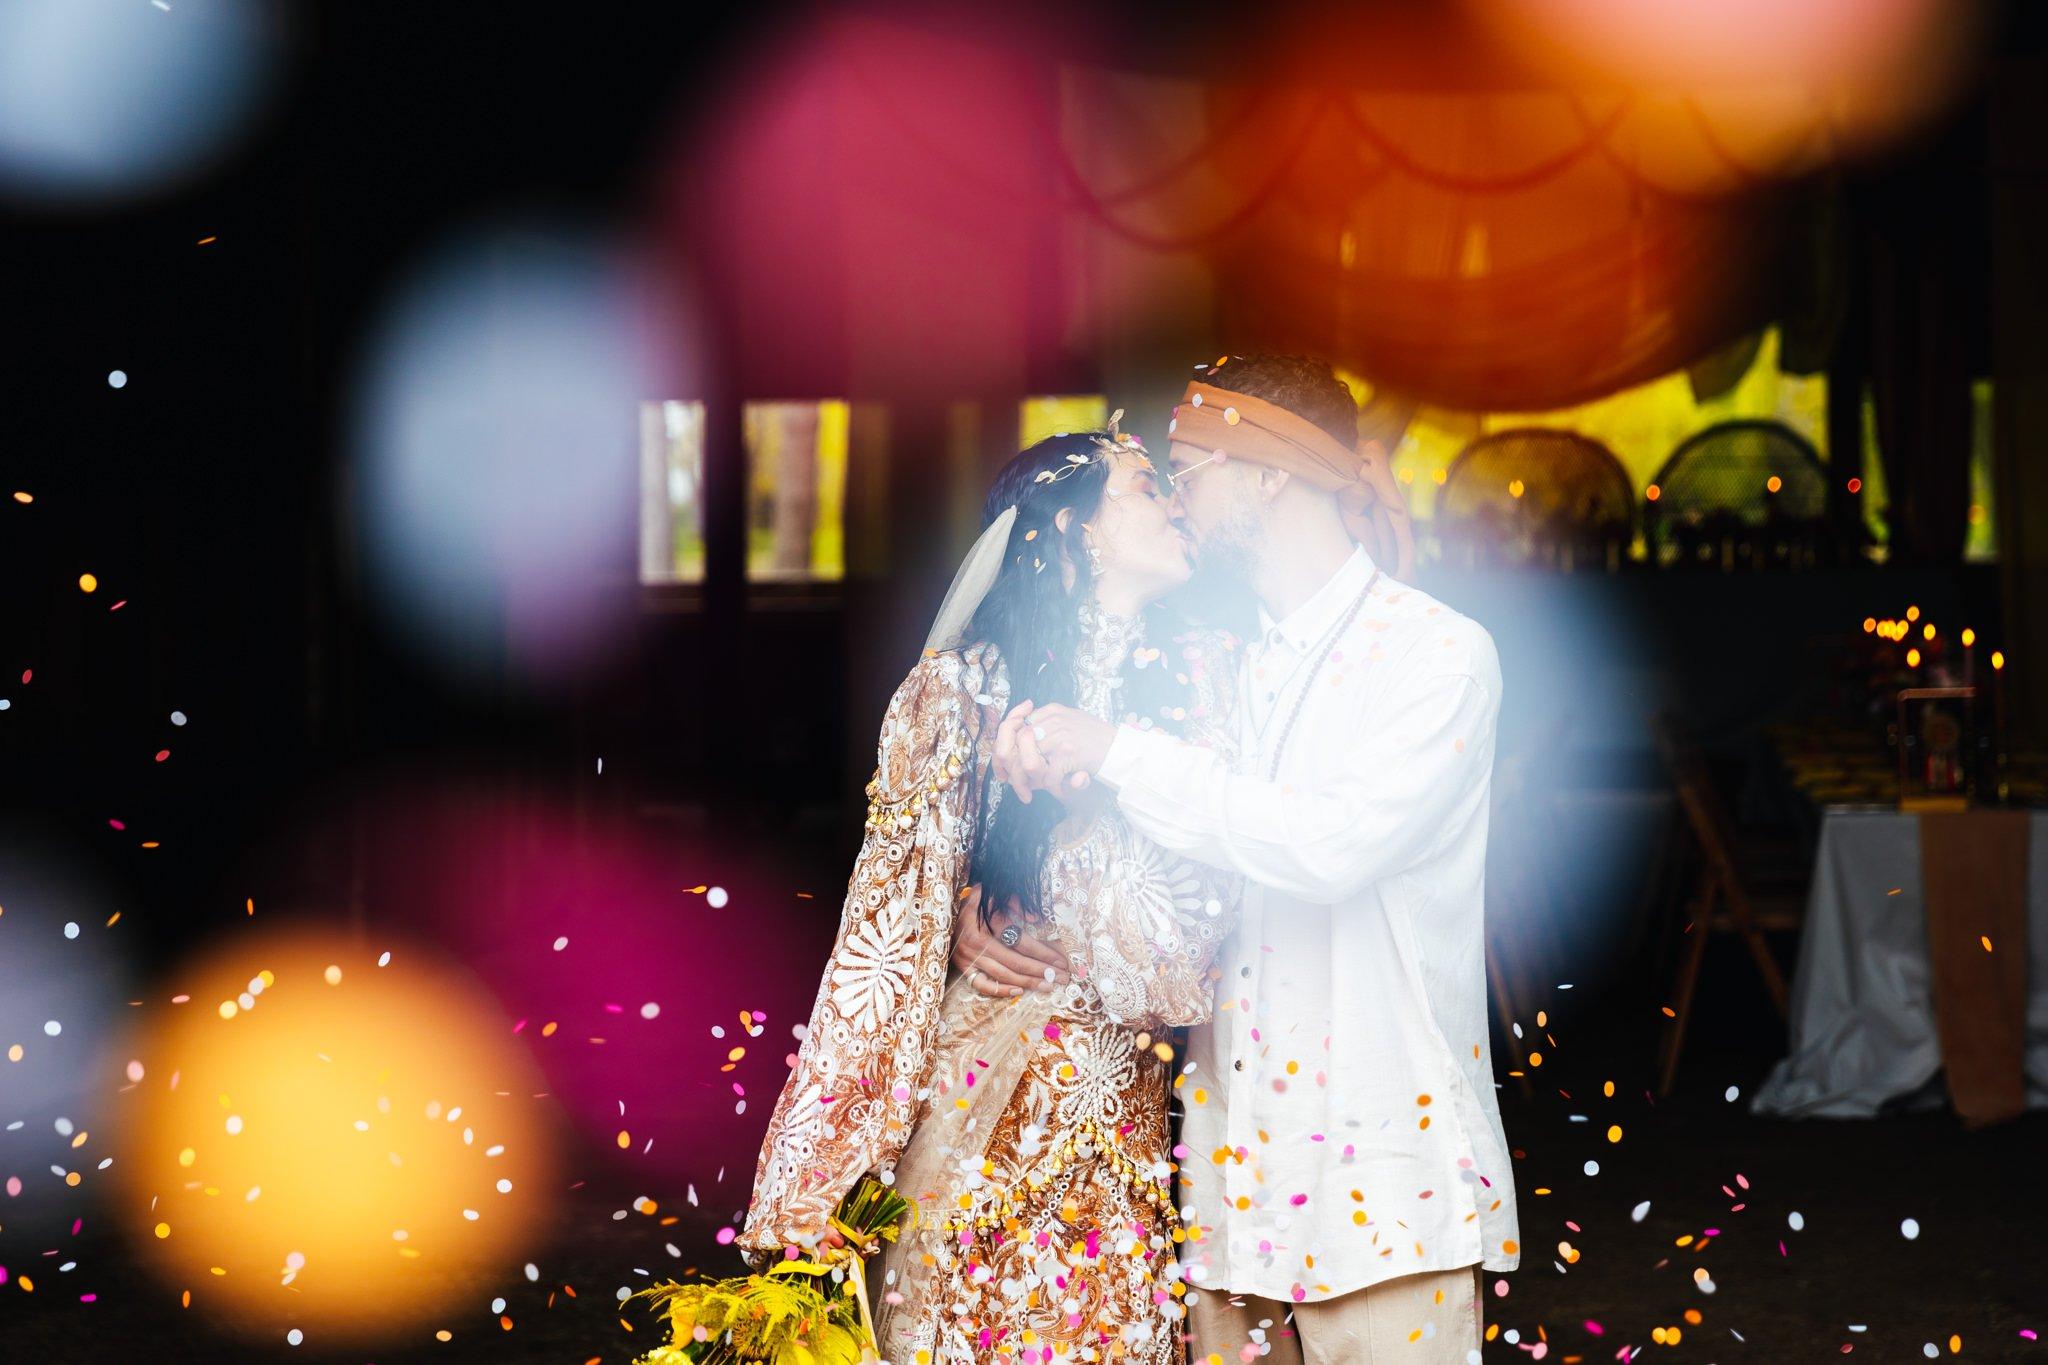 Fun wedding photography - couple during confetti throw at their weddings